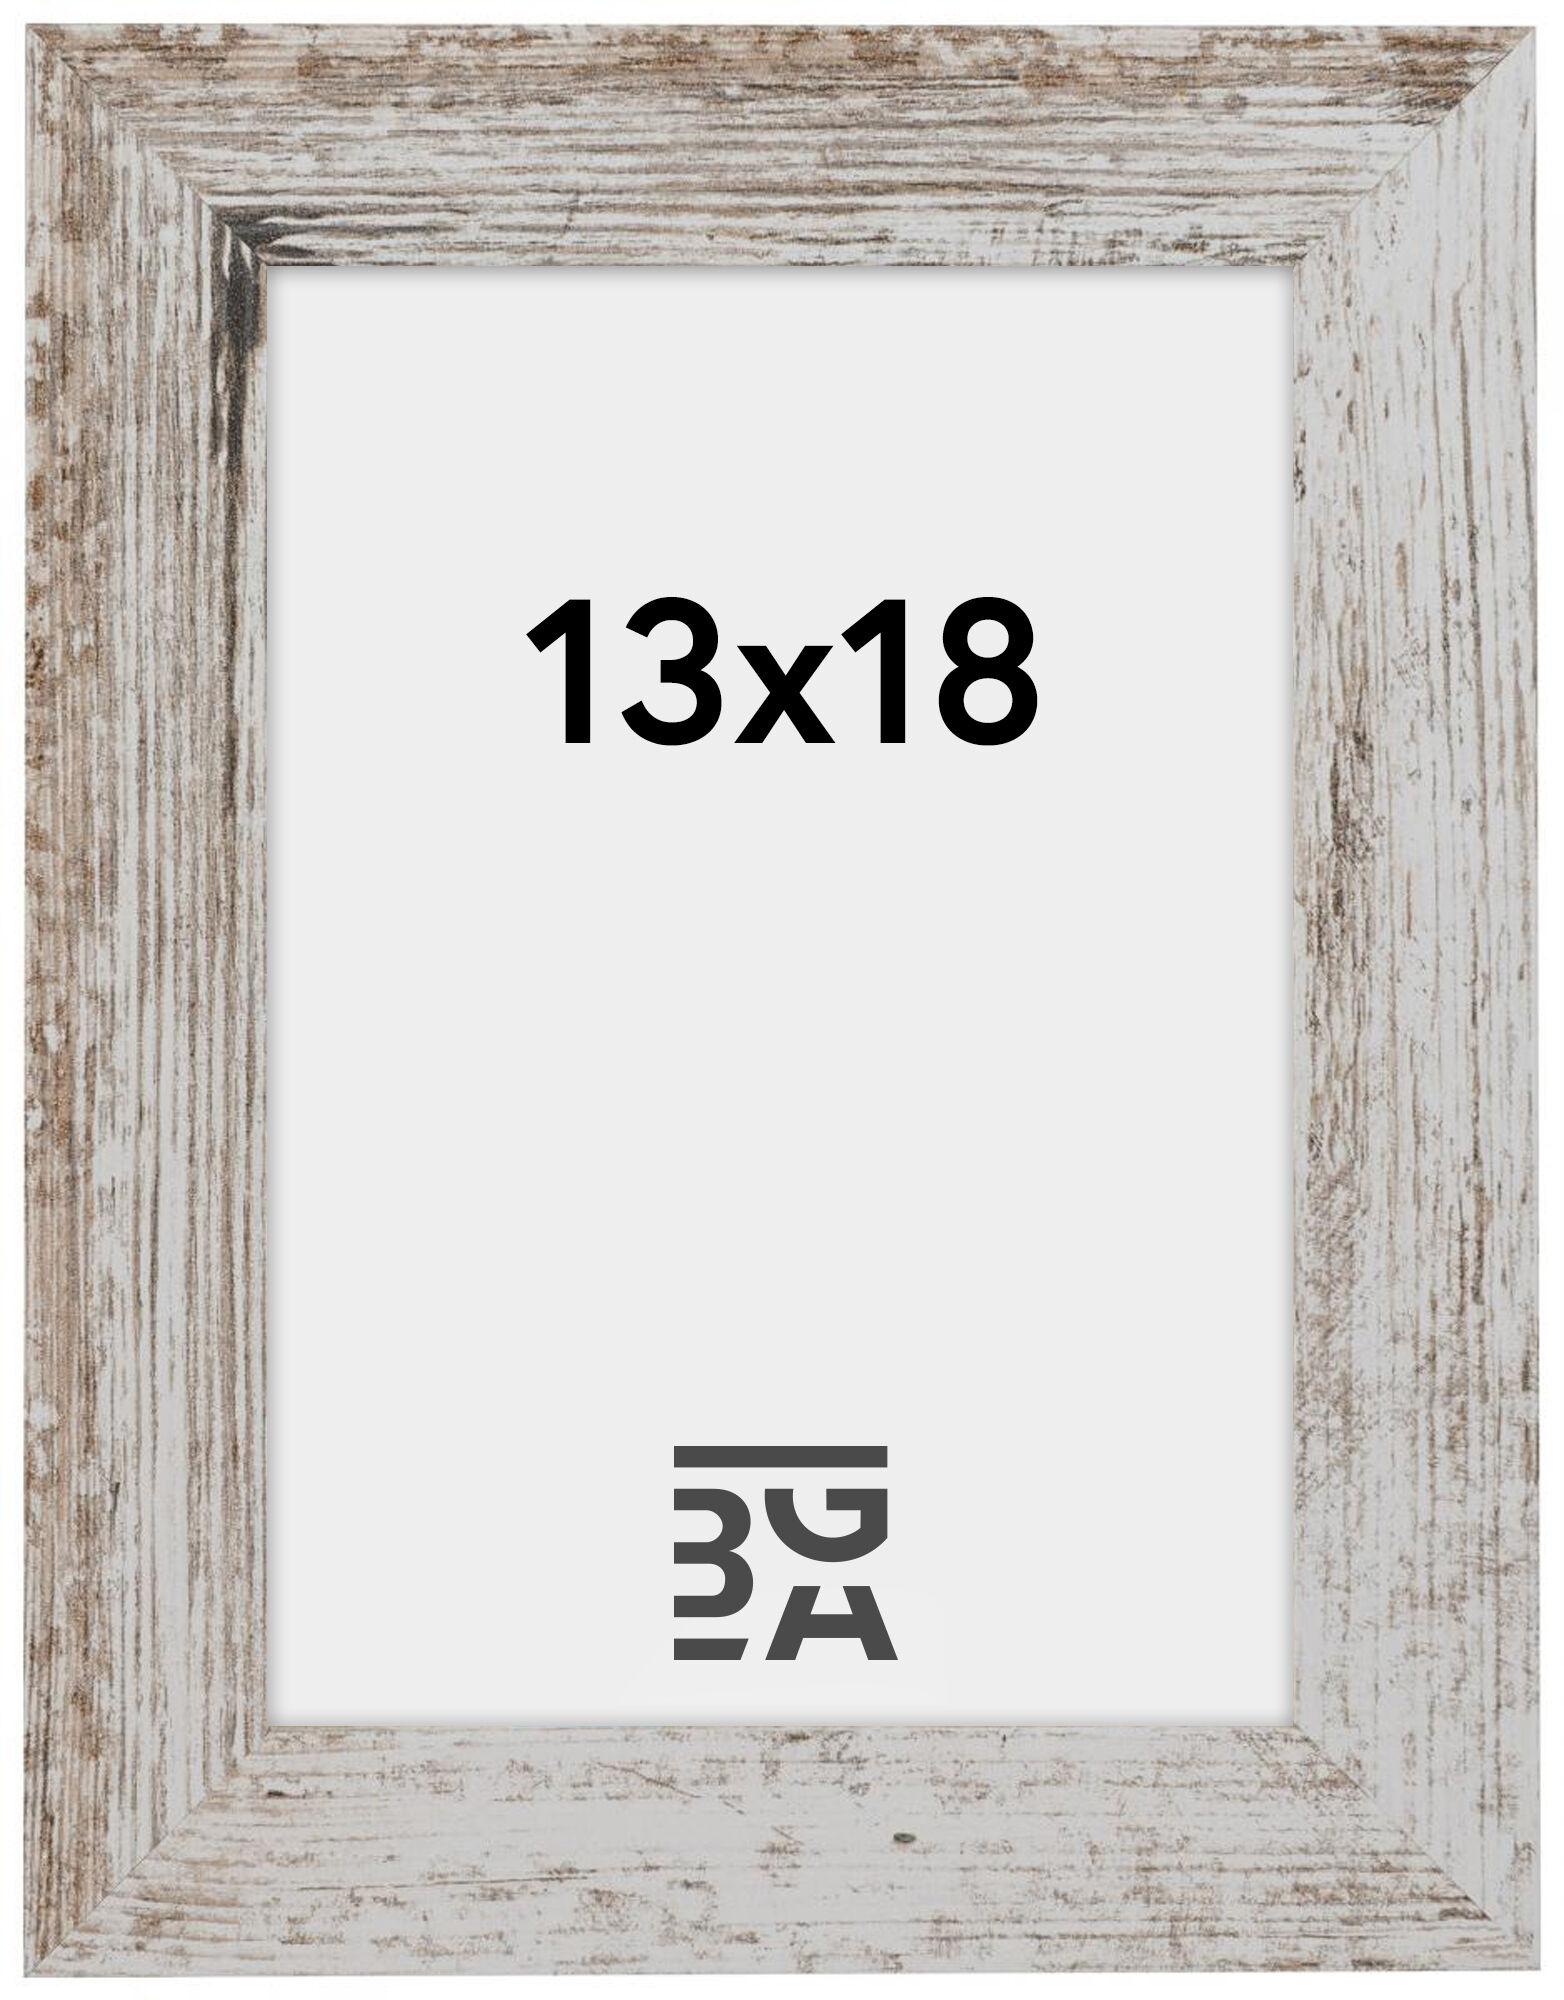 Estancia Superb AA 13x18 cm